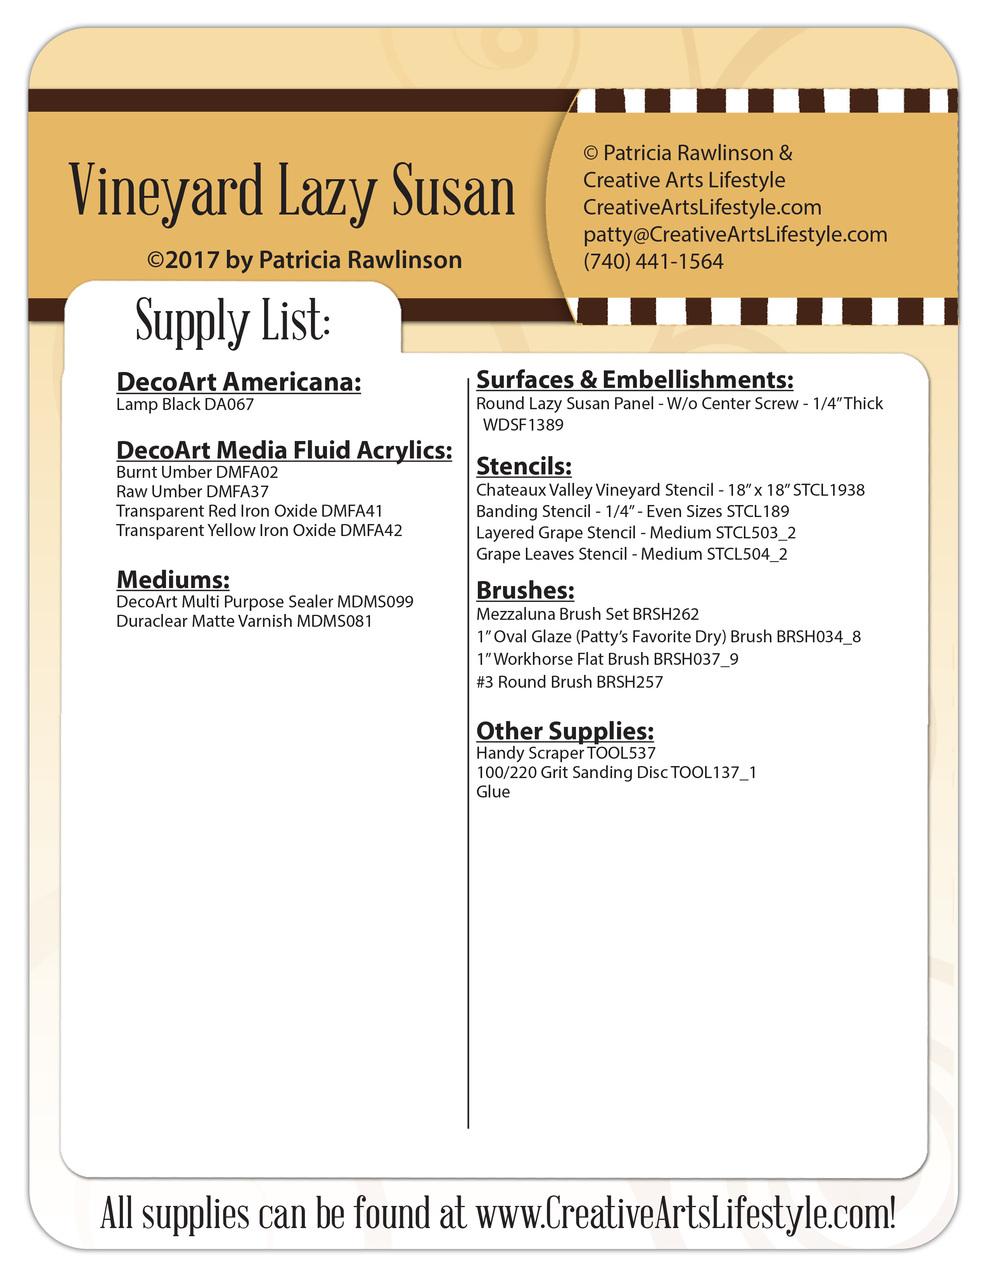 Vineyard Lazy Susan - DVD and Pattern Packet - Patricia Rawlinson